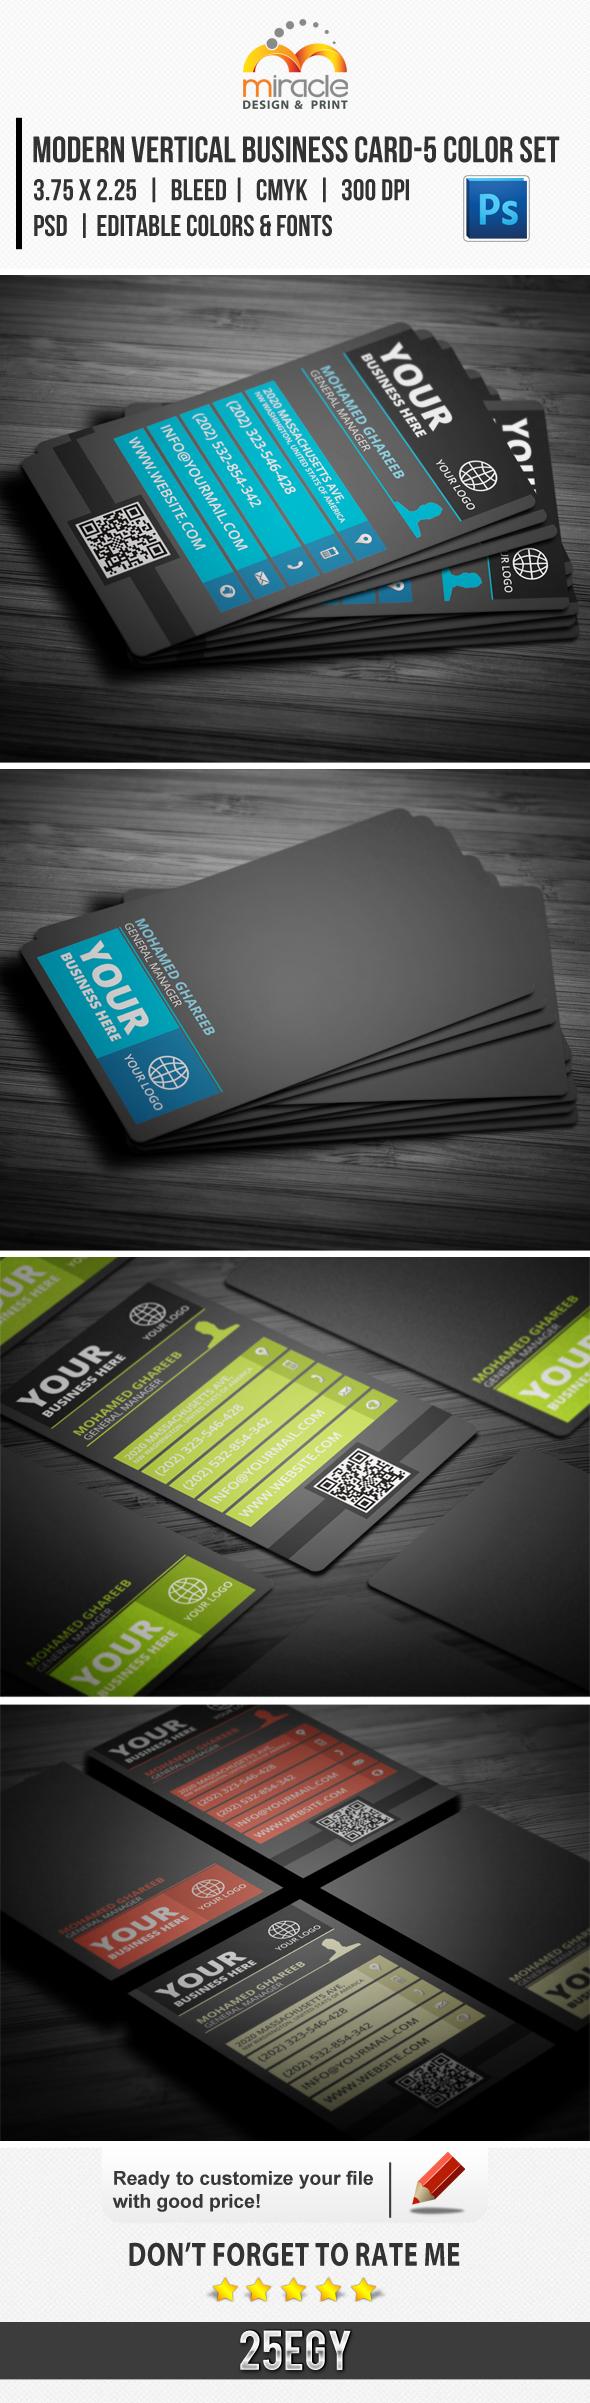 Modern Vertical Business Card-5 Color Set by EgYpToS